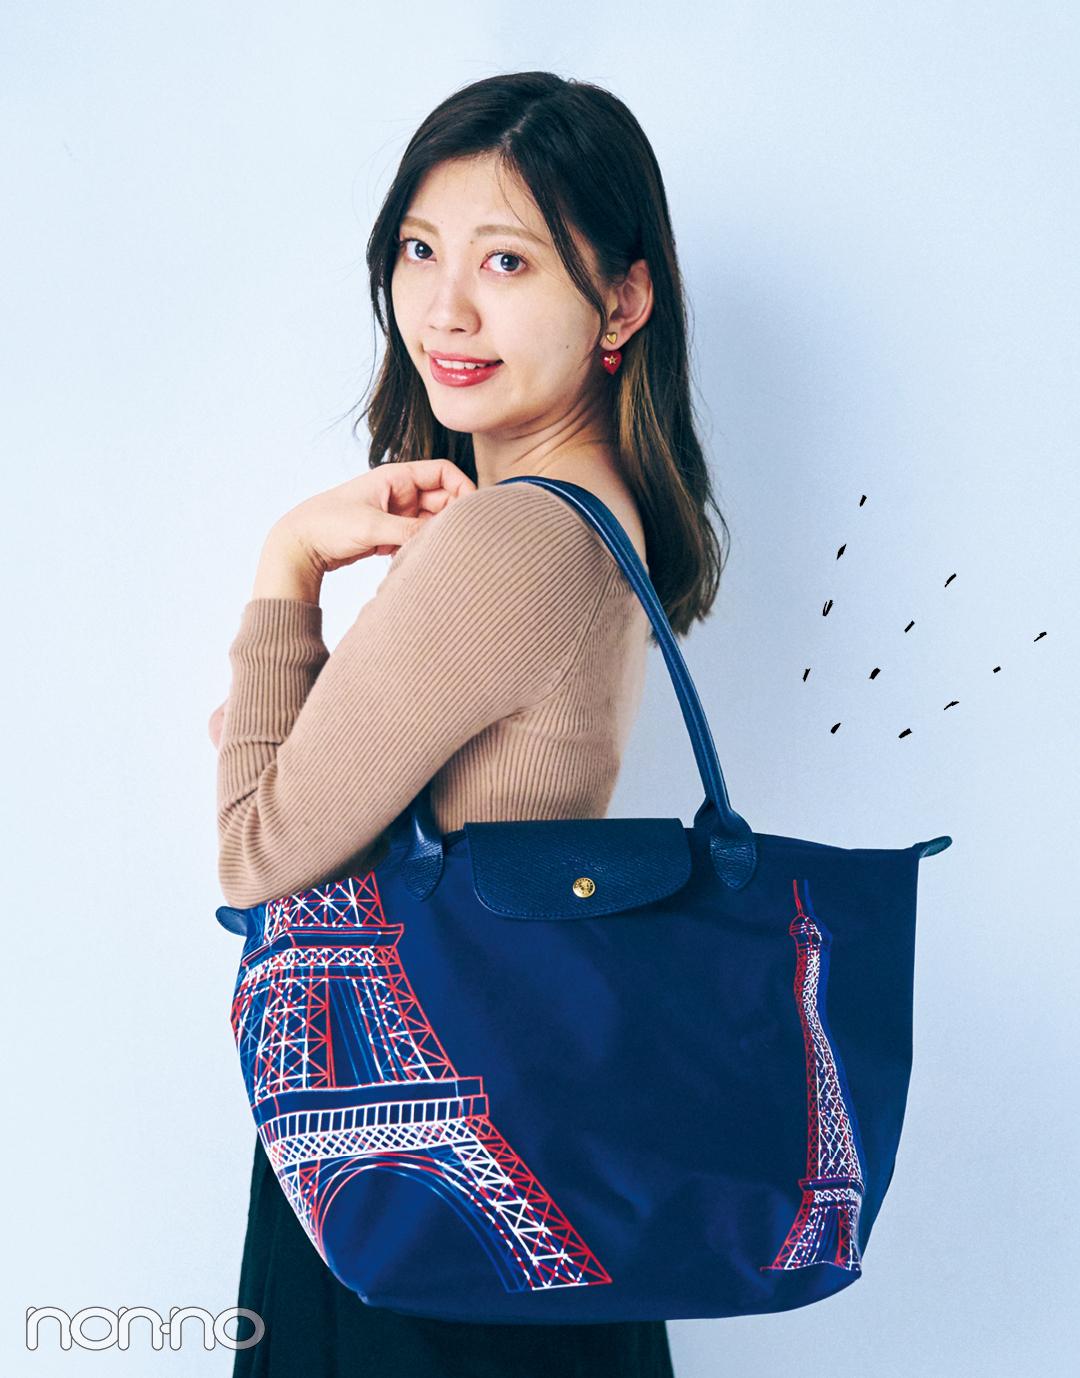 Photo Gallery|新しい日常を支える「バッグの中身」大調査! _1_6